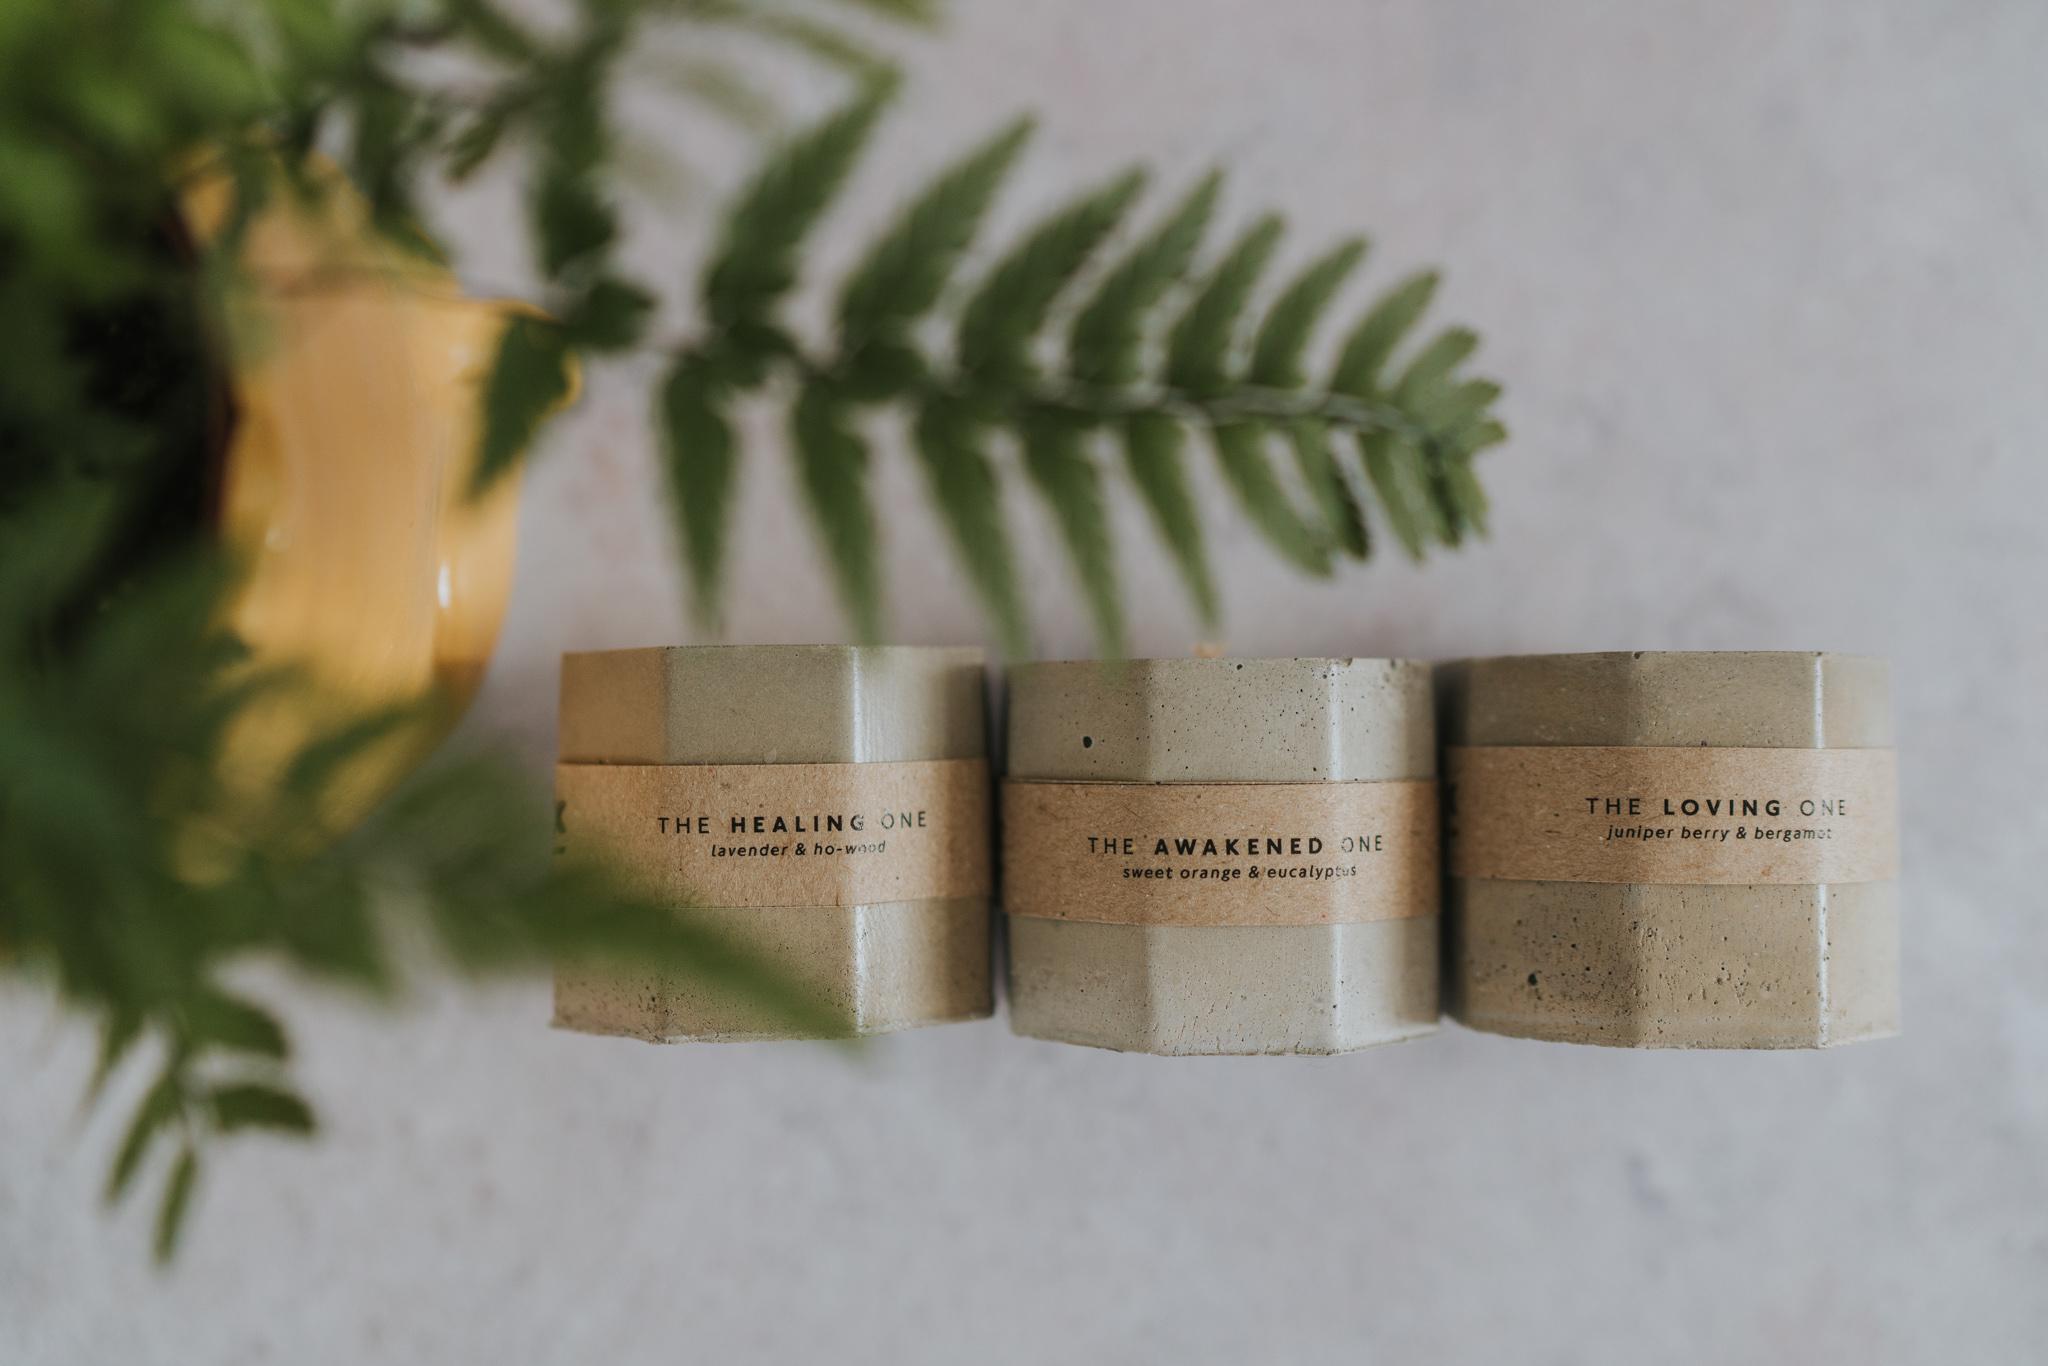 business-branding-panpank-candles-grace-elizabeth-colchester-essex-devon-suffolk-and-norfolk-alternative-wedding-and-family-photographer (3 of 19).jpg